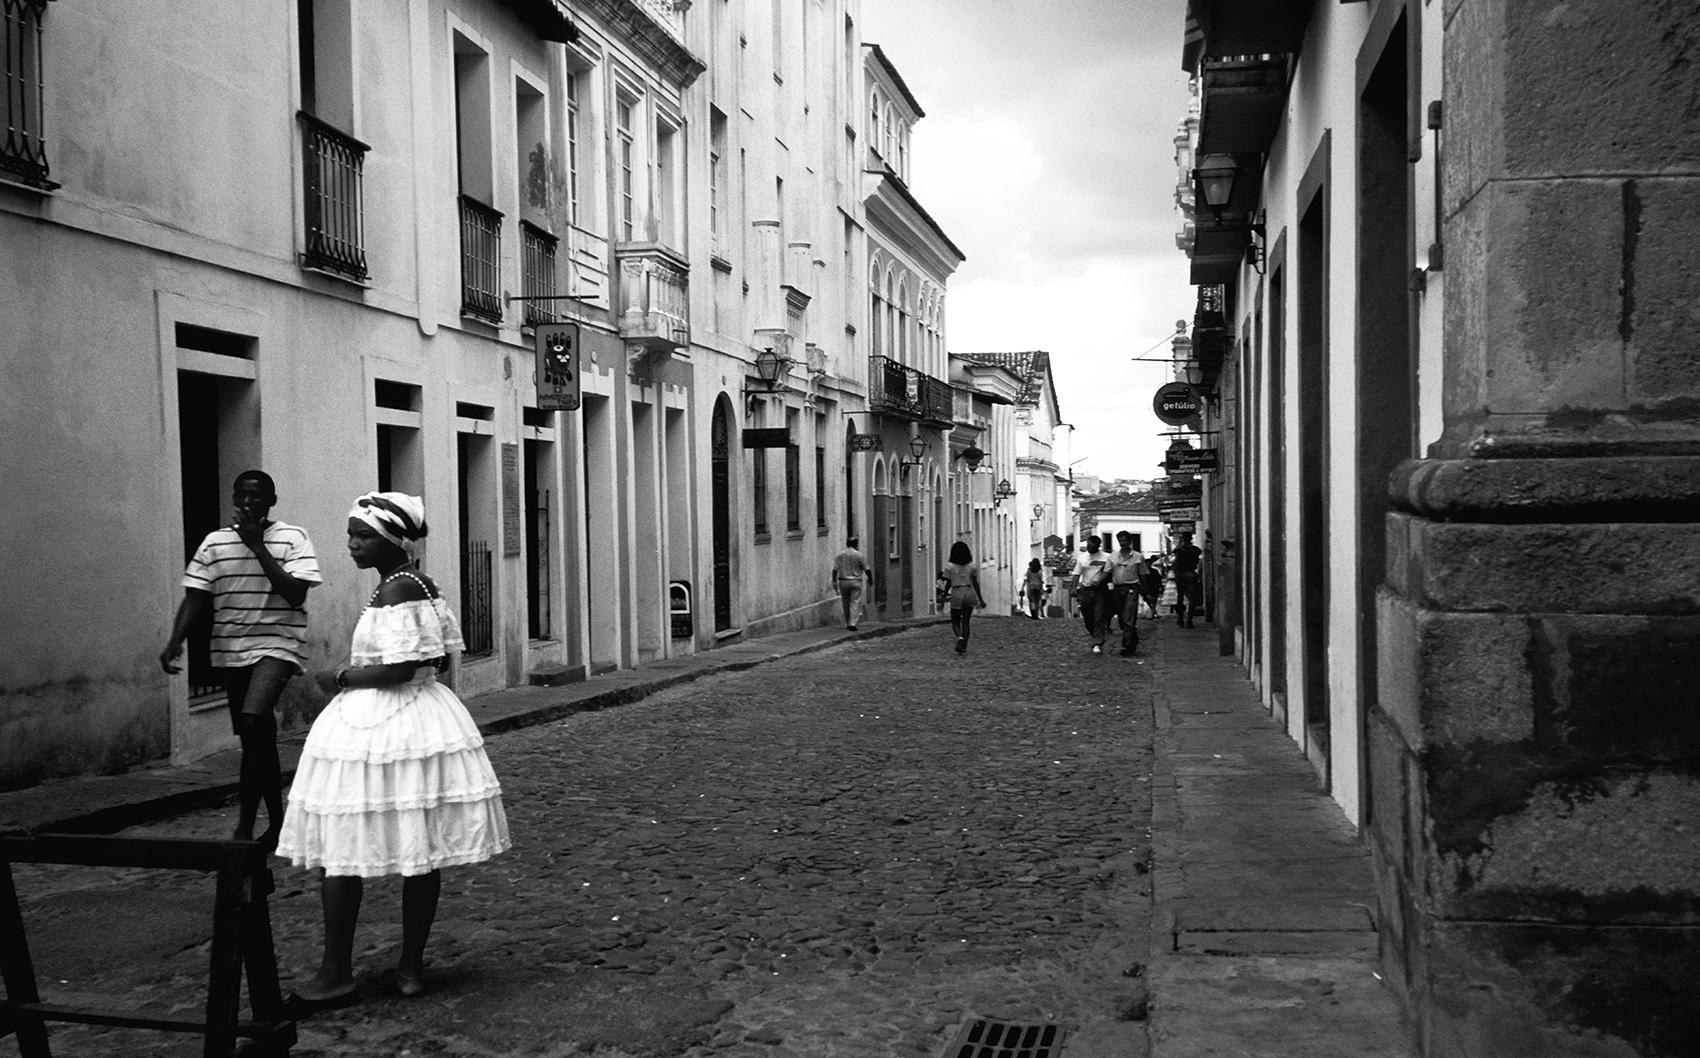 Sonia_Costa_Street life_Brasil